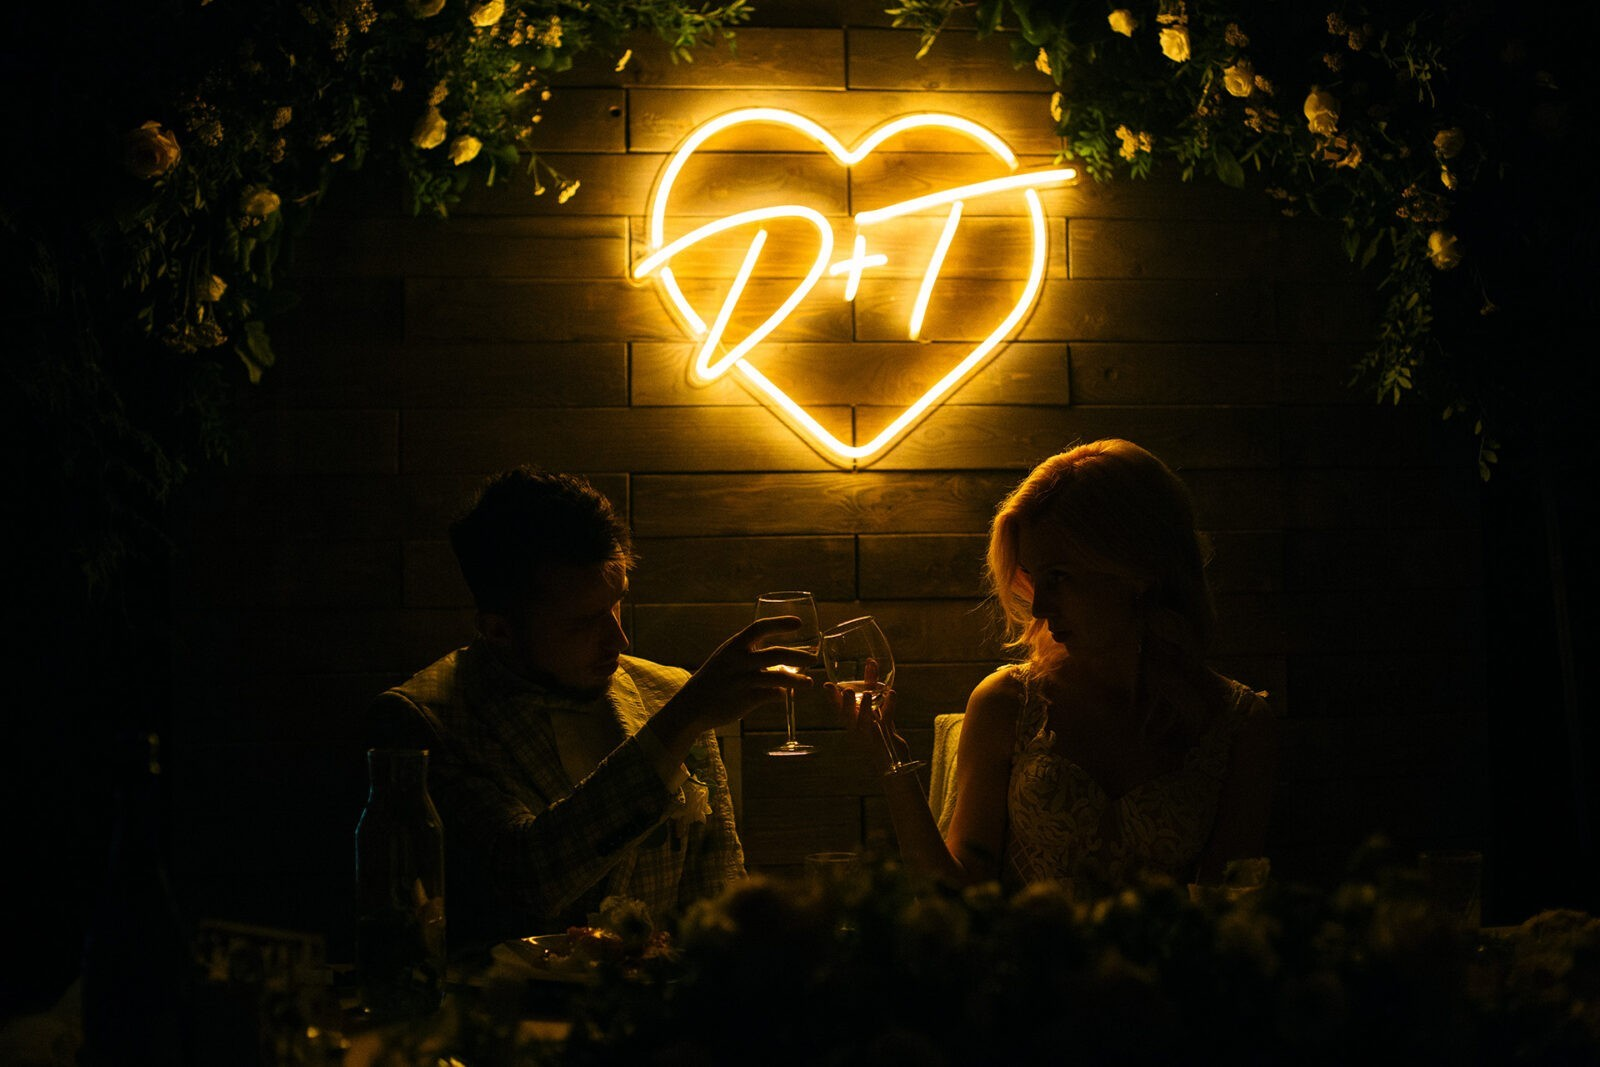 Сердце с инициалами